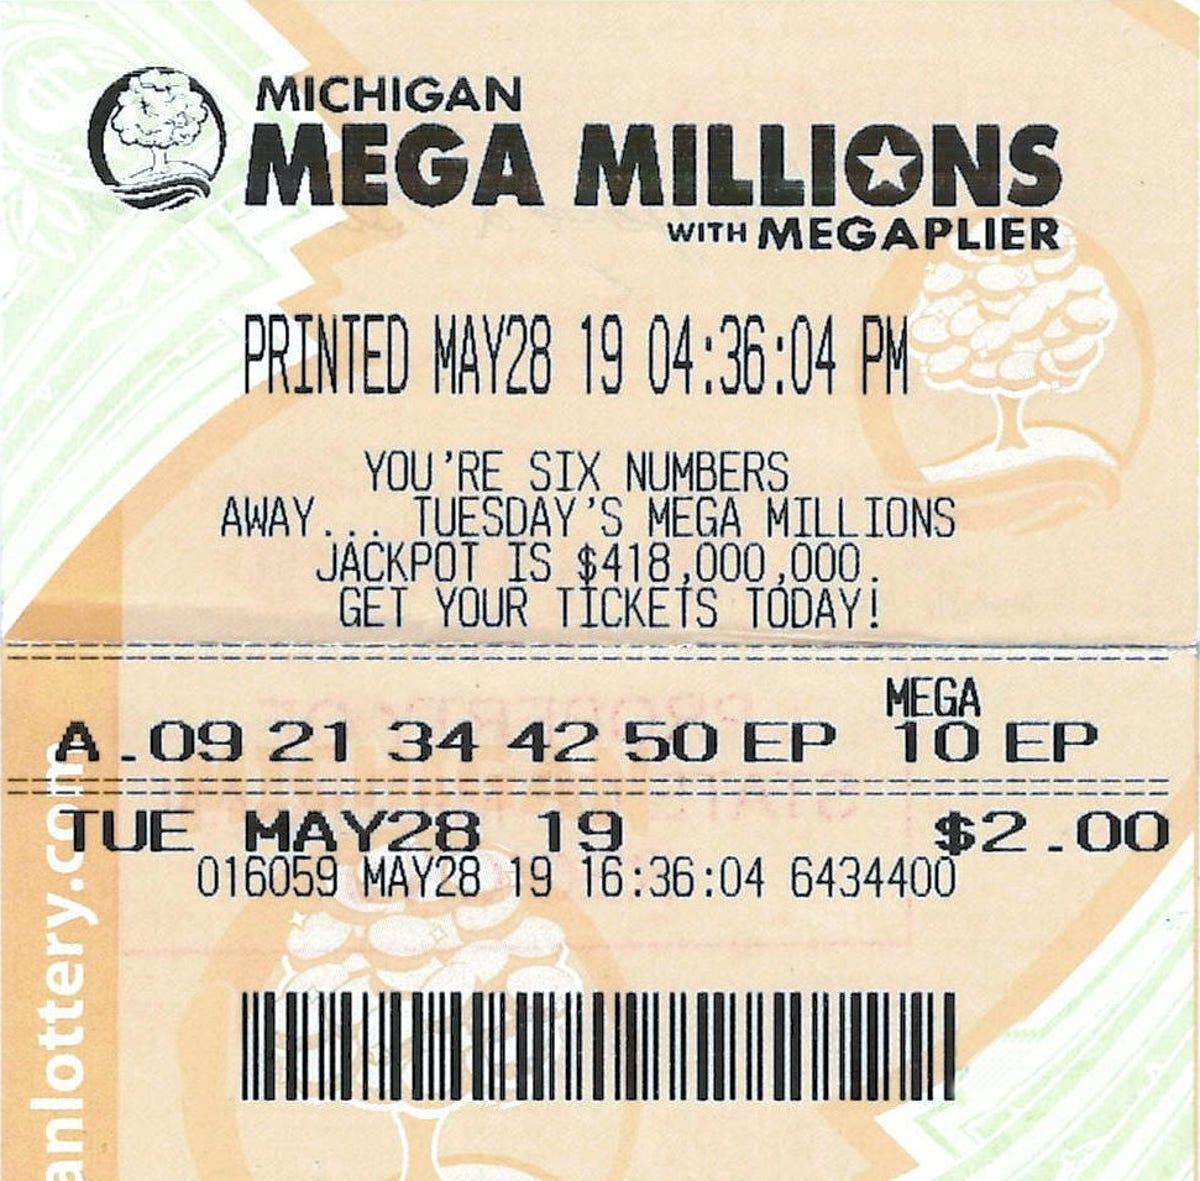 Mulliken man wins $1 million in Mega Millions drawing